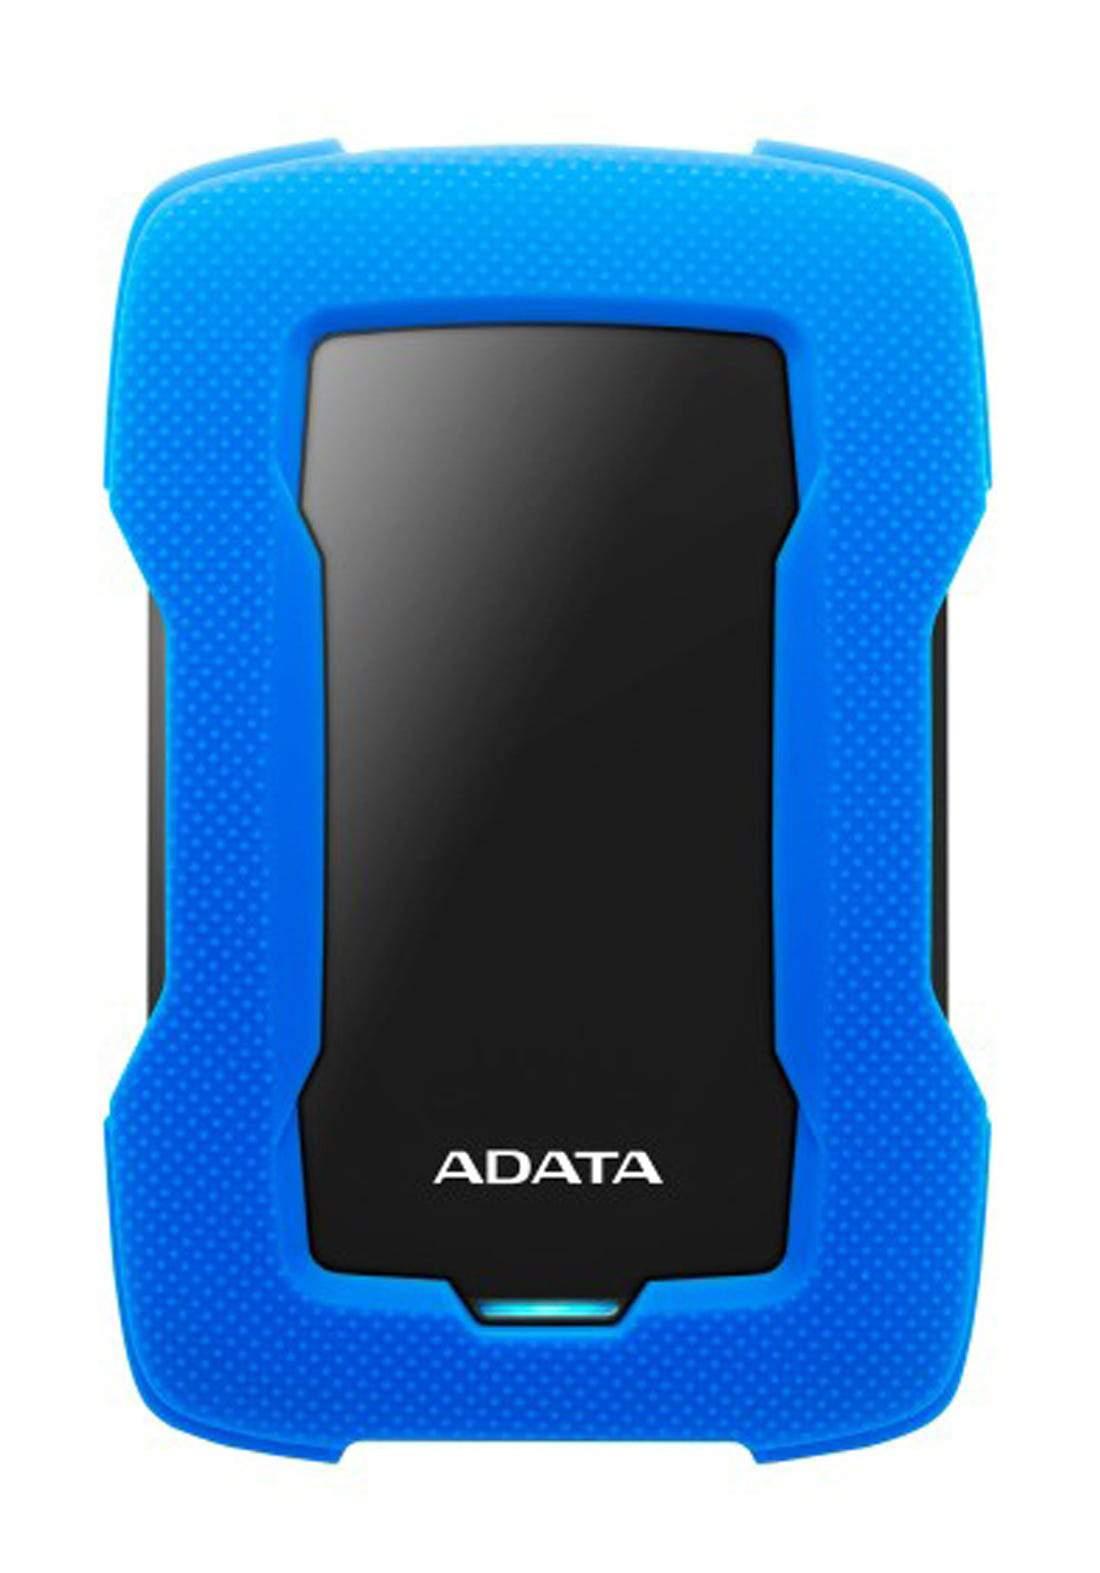 ADATA HD 330 4TB Portable External Hard Drive - Blue هارد خارجي